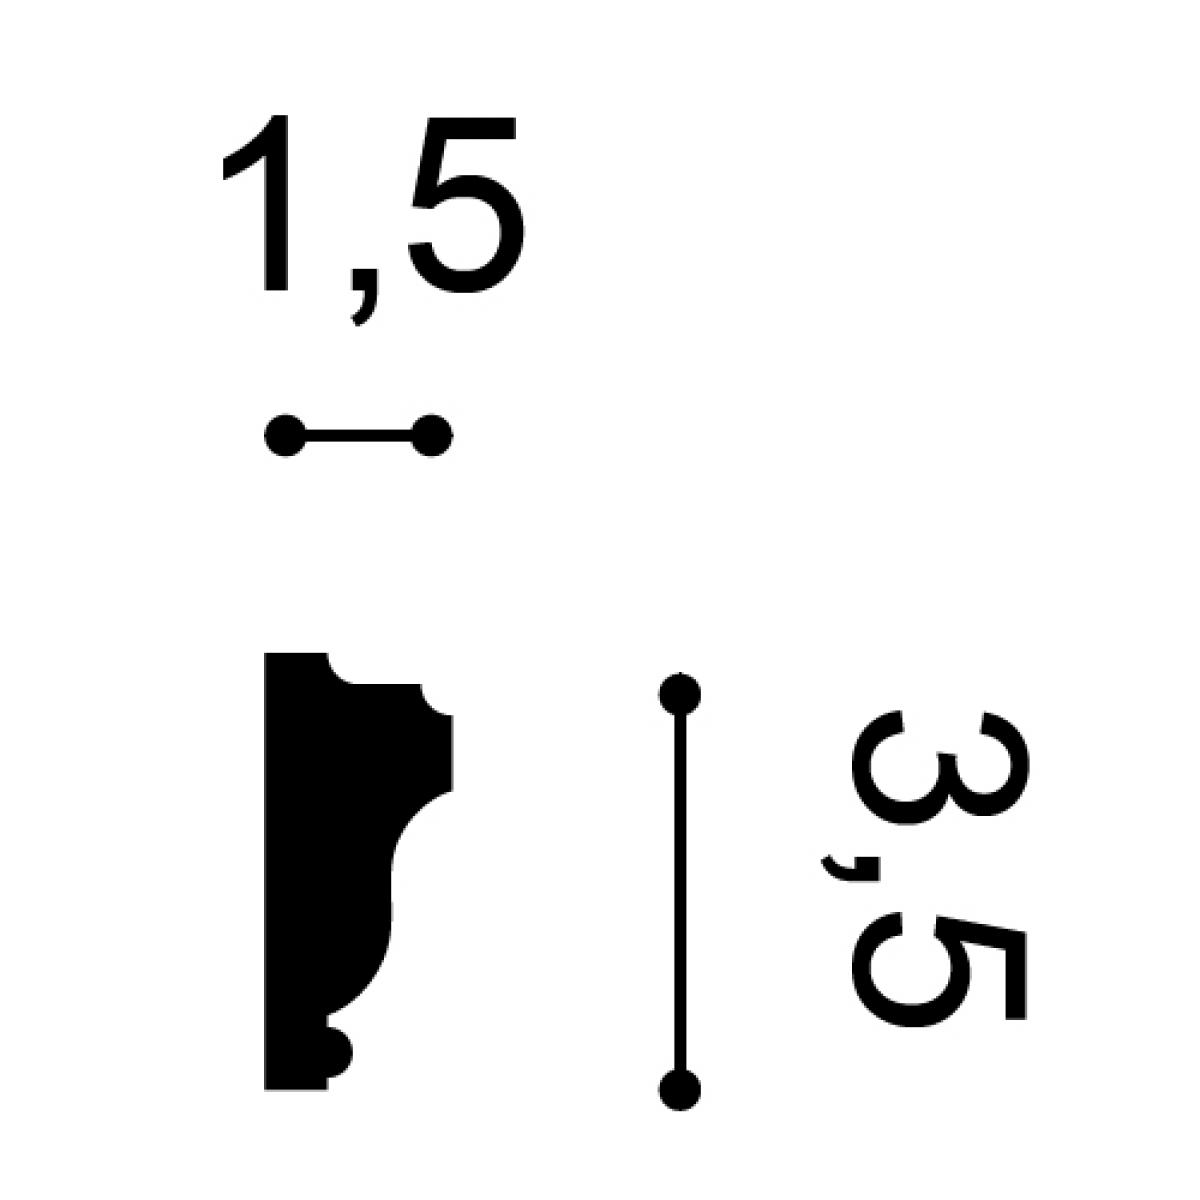 Brau Axxent PX117, Dimensiuni: 200 X 3.5 X 1.5 cm, Orac Decor